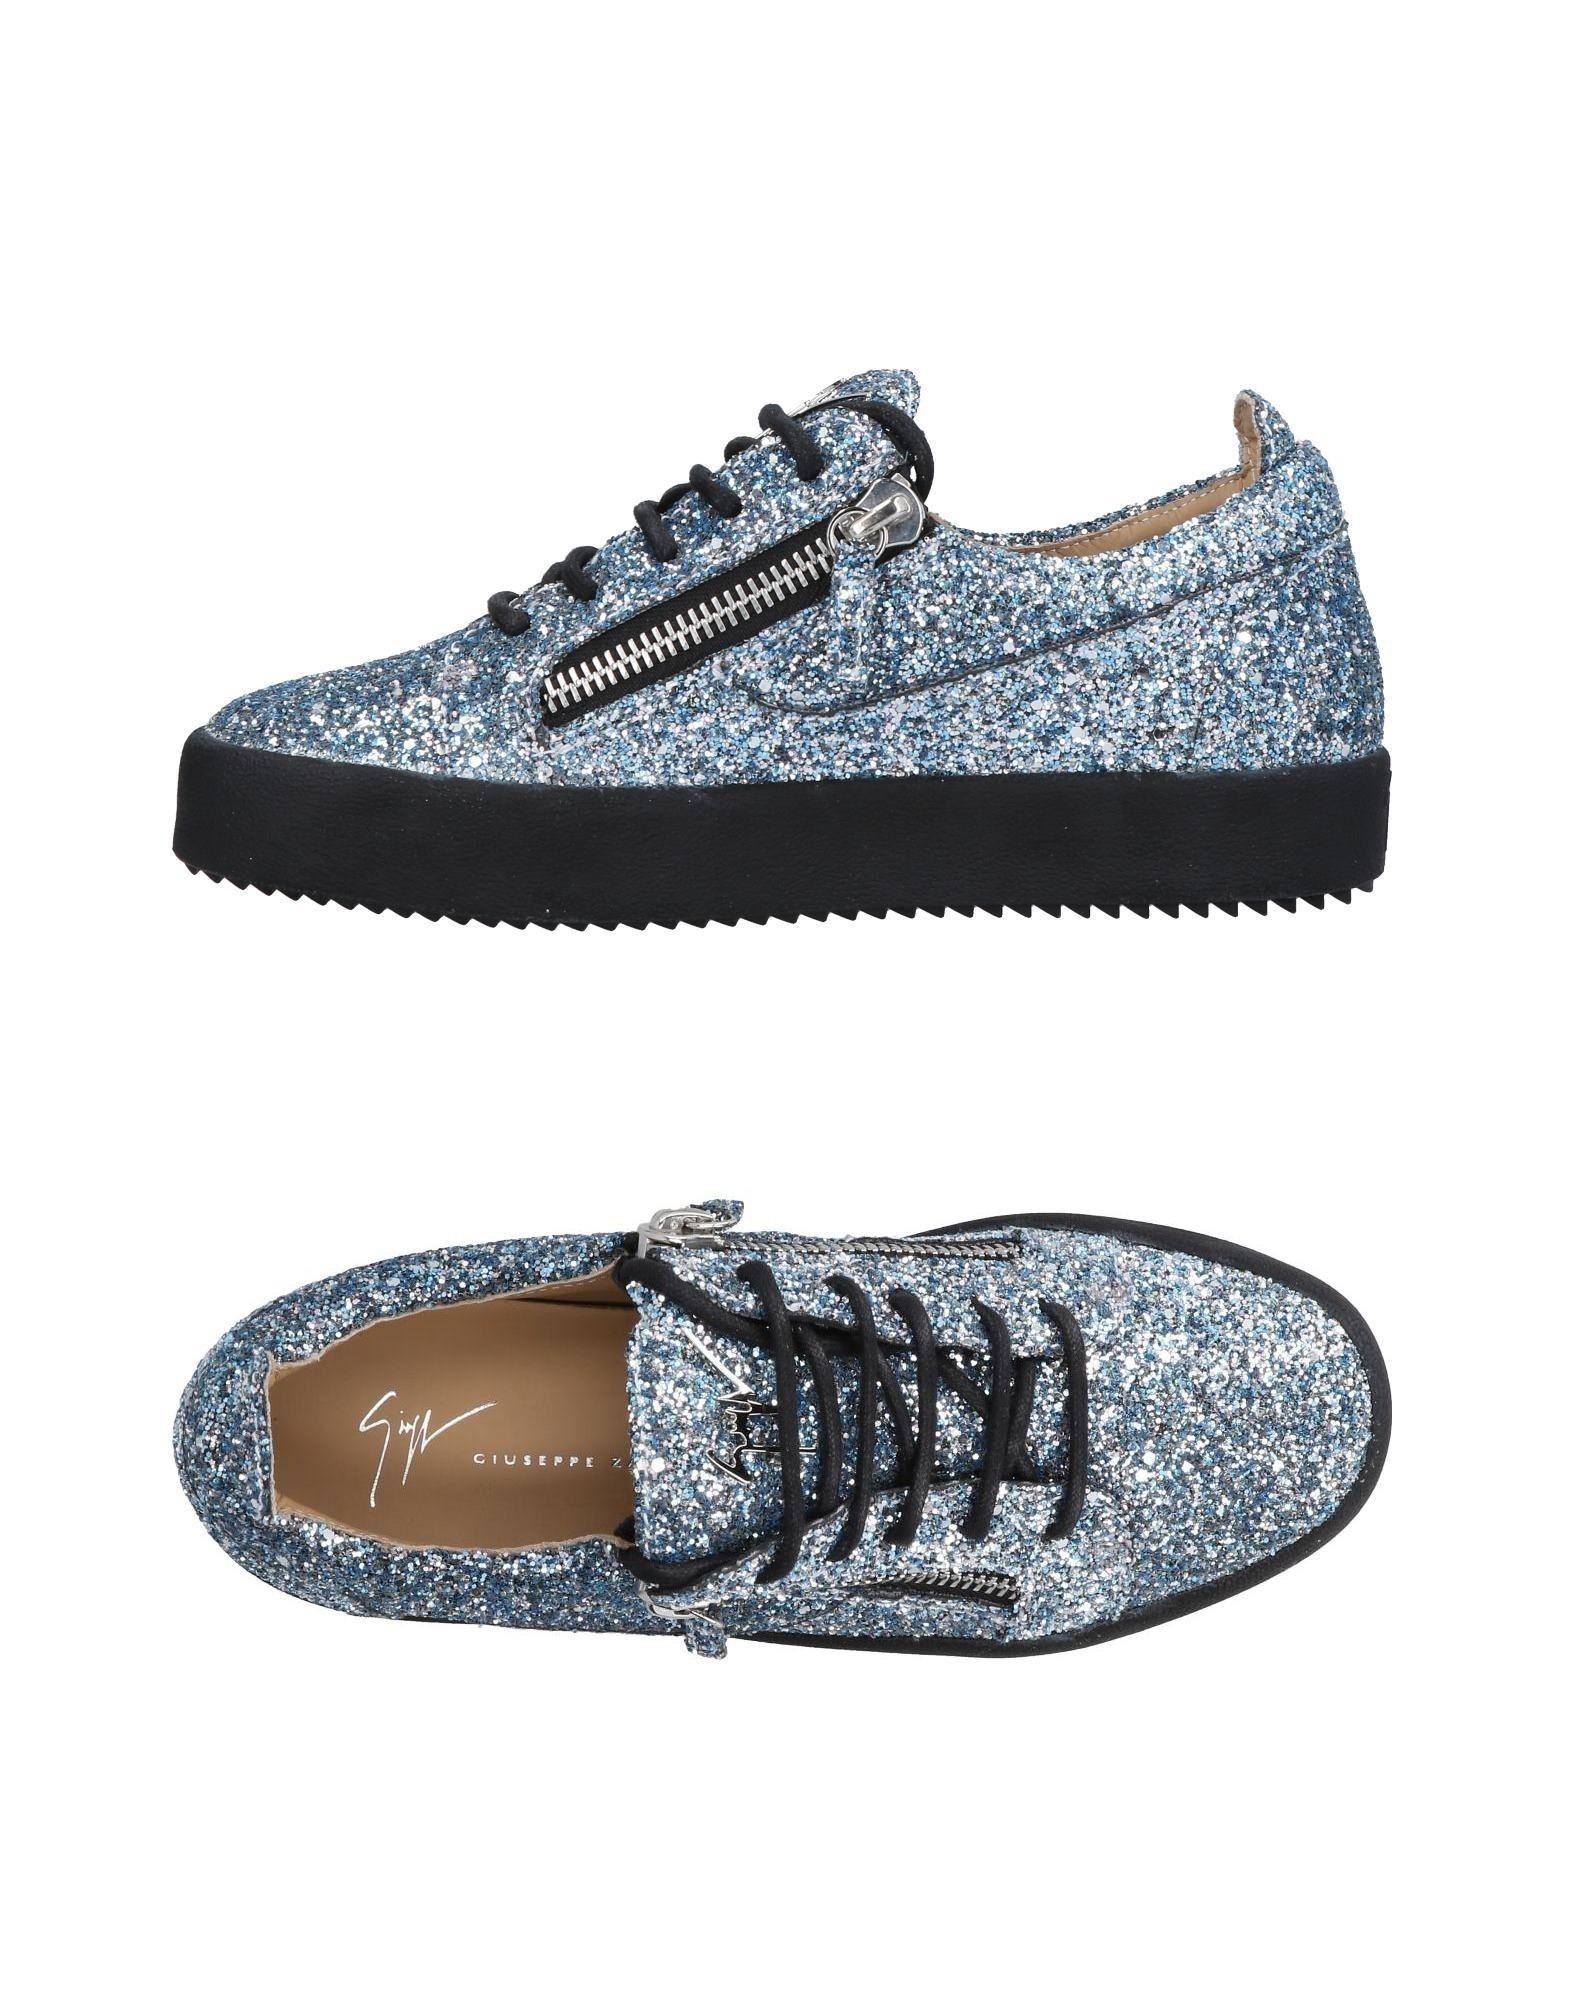 Baskets Giuseppe Zanotti Femme - Baskets Giuseppe Zanotti Bleu d'azur Dernières chaussures discount pour hommes et femmes